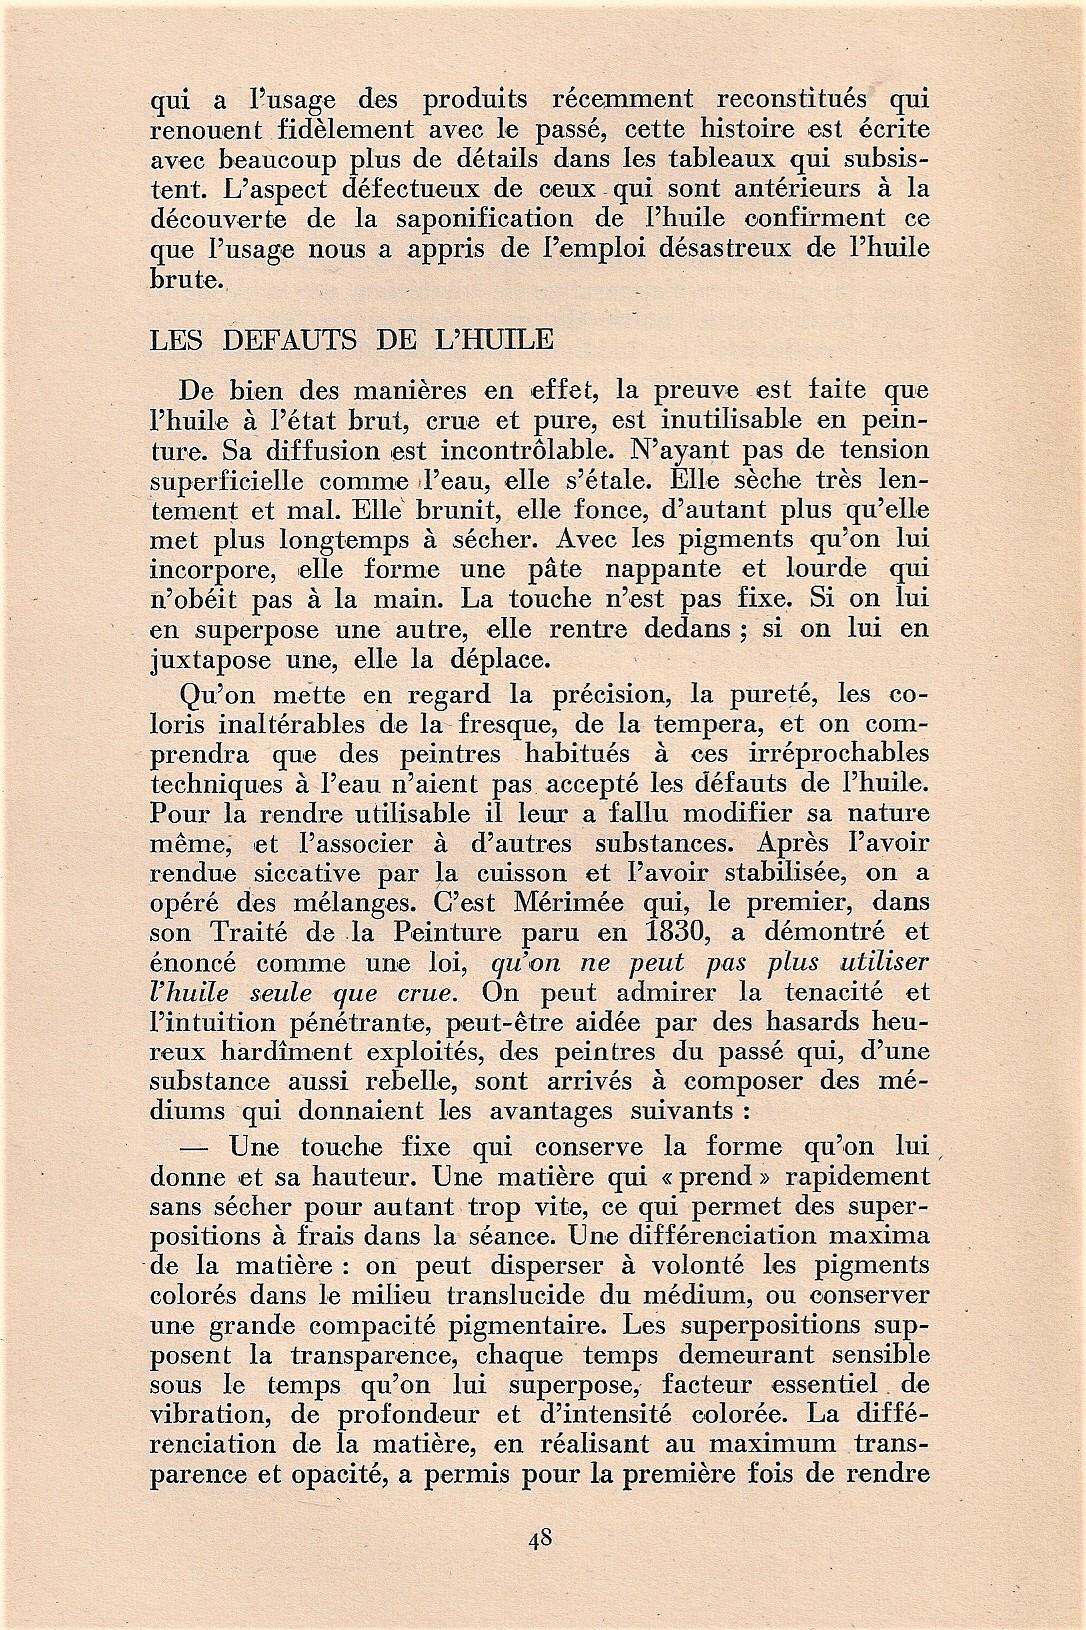 versini-page-48.jpg